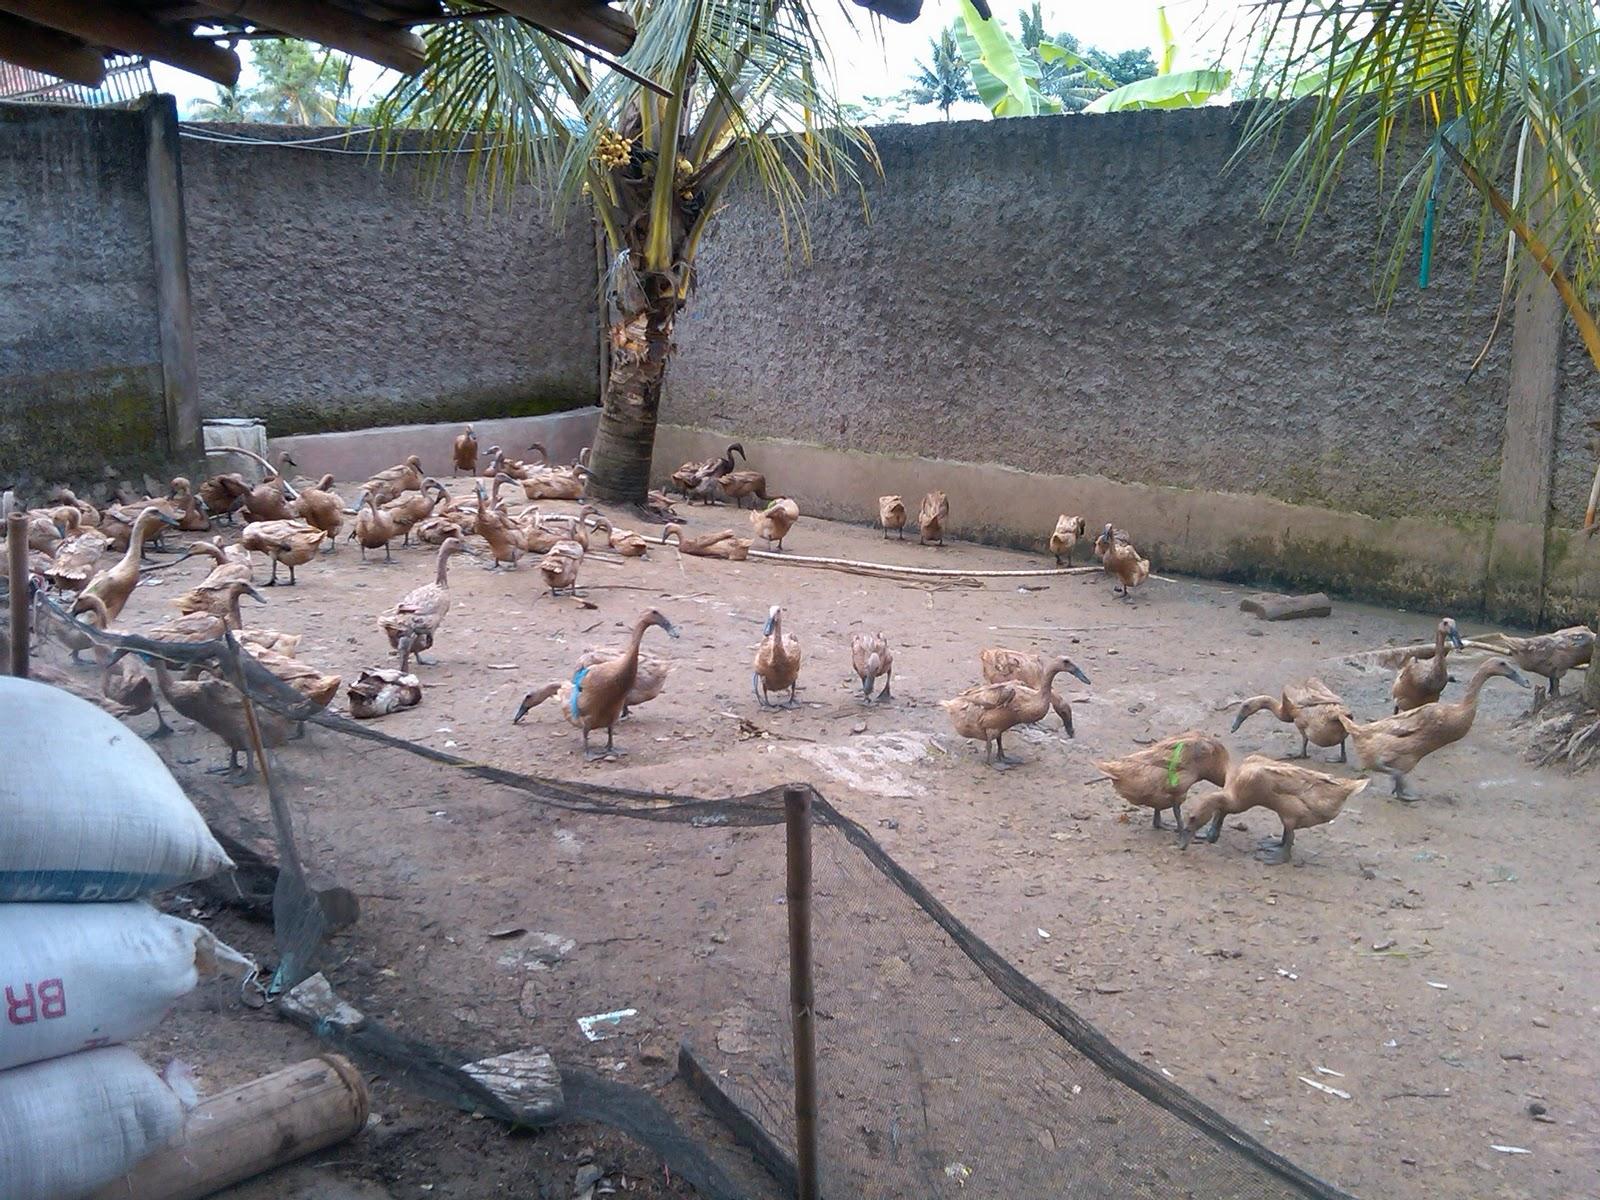 Bebek Cianjur Ayam Pelung Turunan Trah Asli Cianjur Jual Ayam Hias Golodog Lembur Kandang Bebek